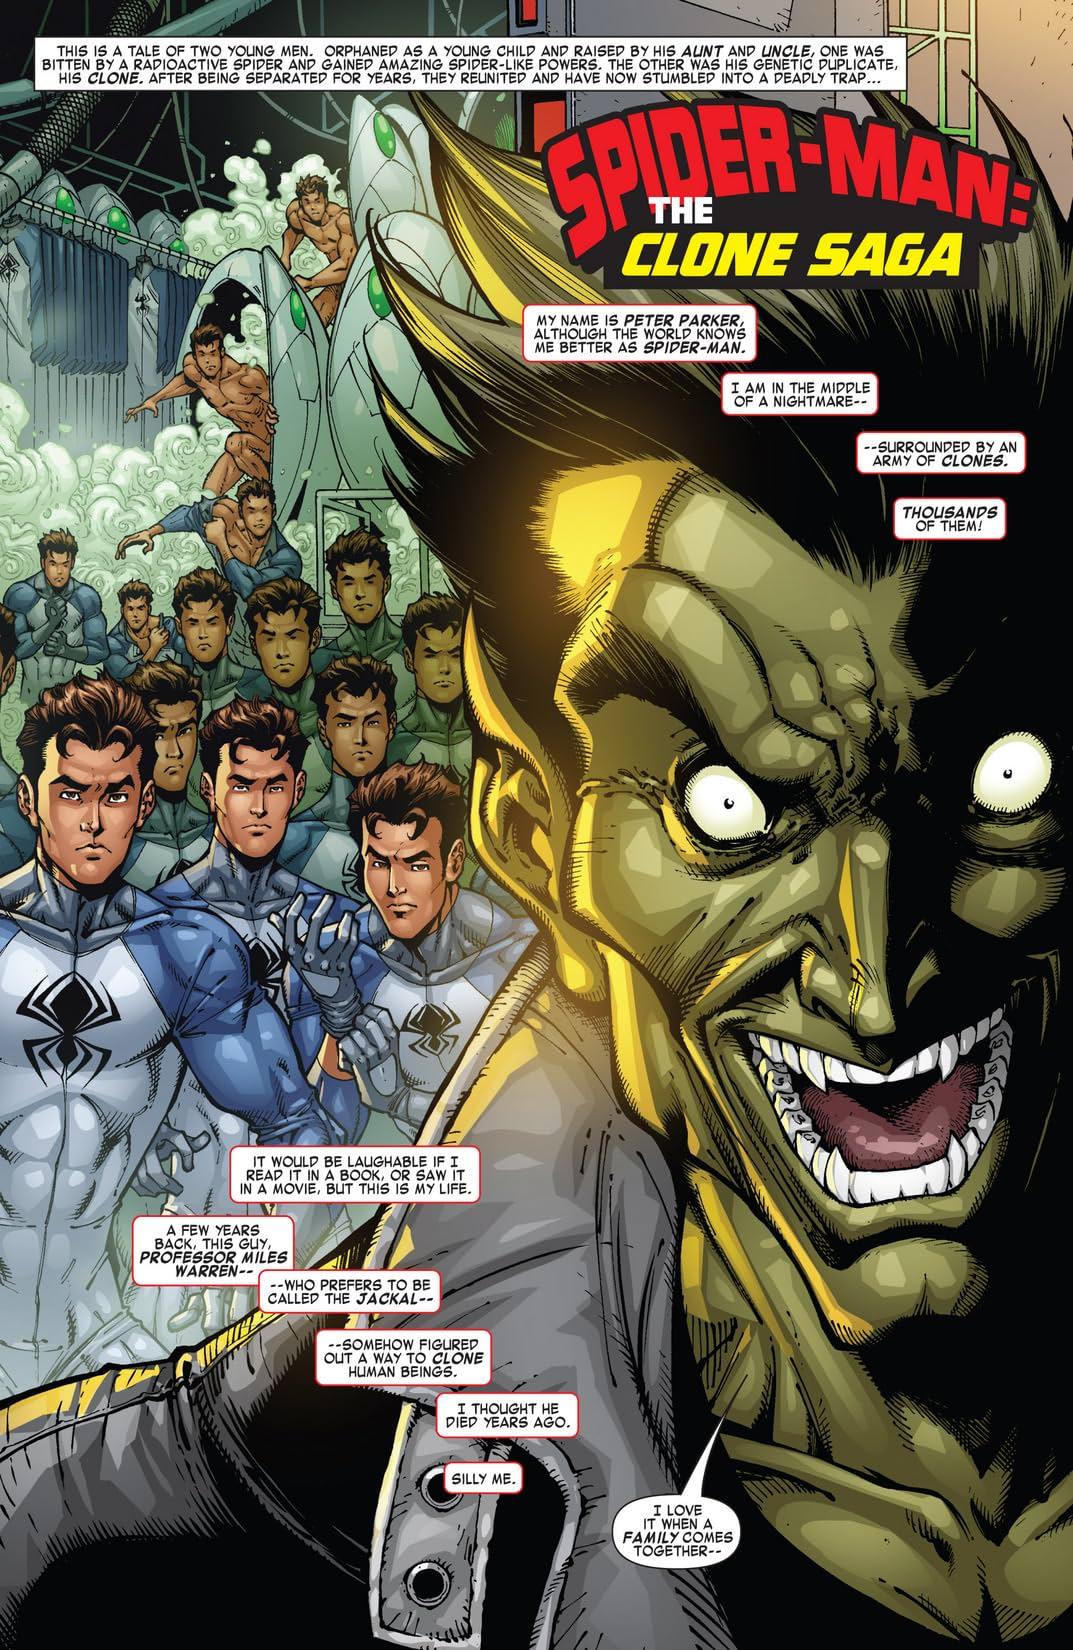 Spider-Man: The Clone Saga #3 (of 6)